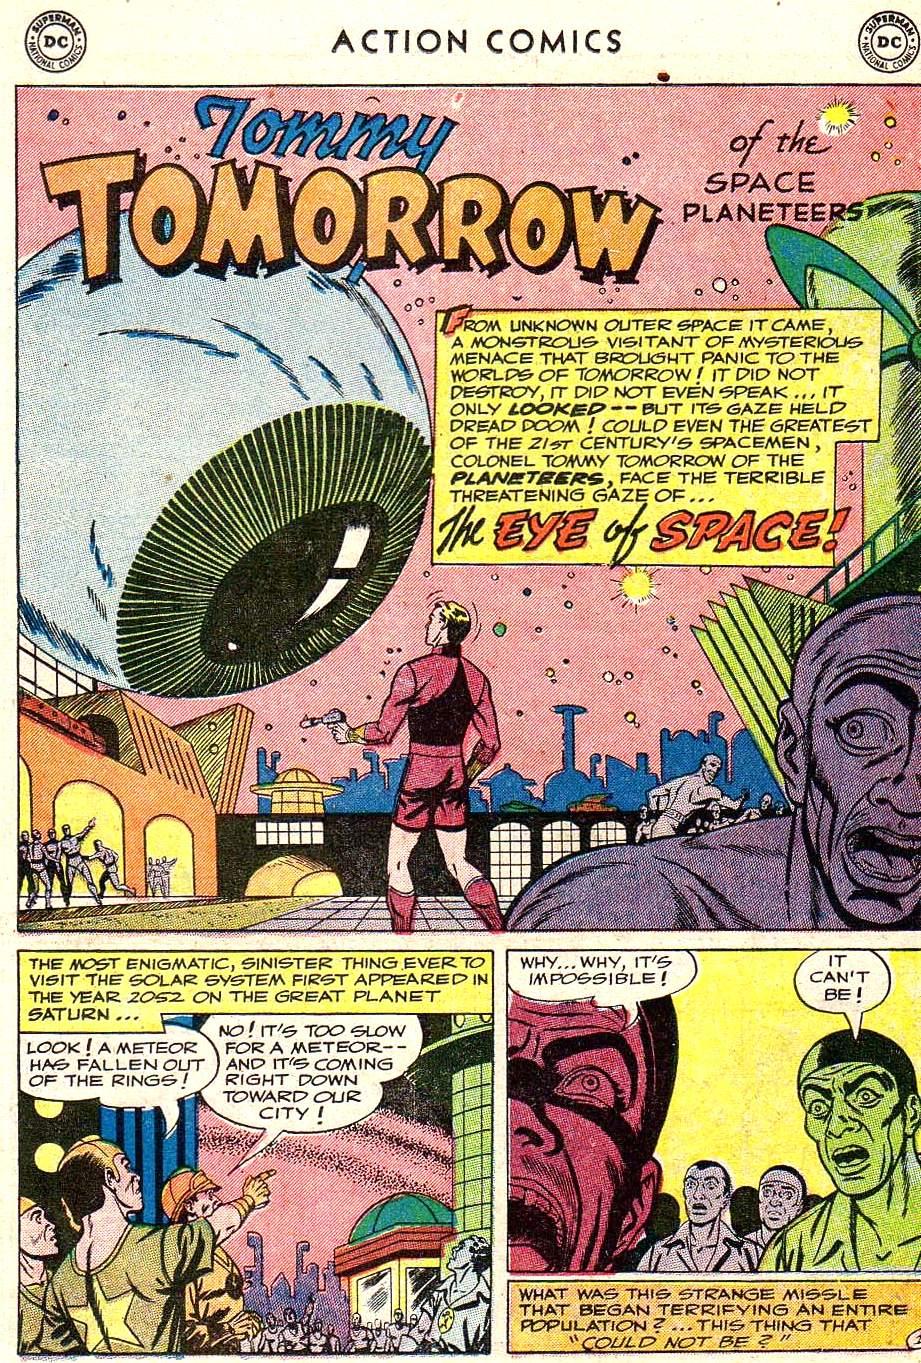 Action Comics (1938) 172 Page 24